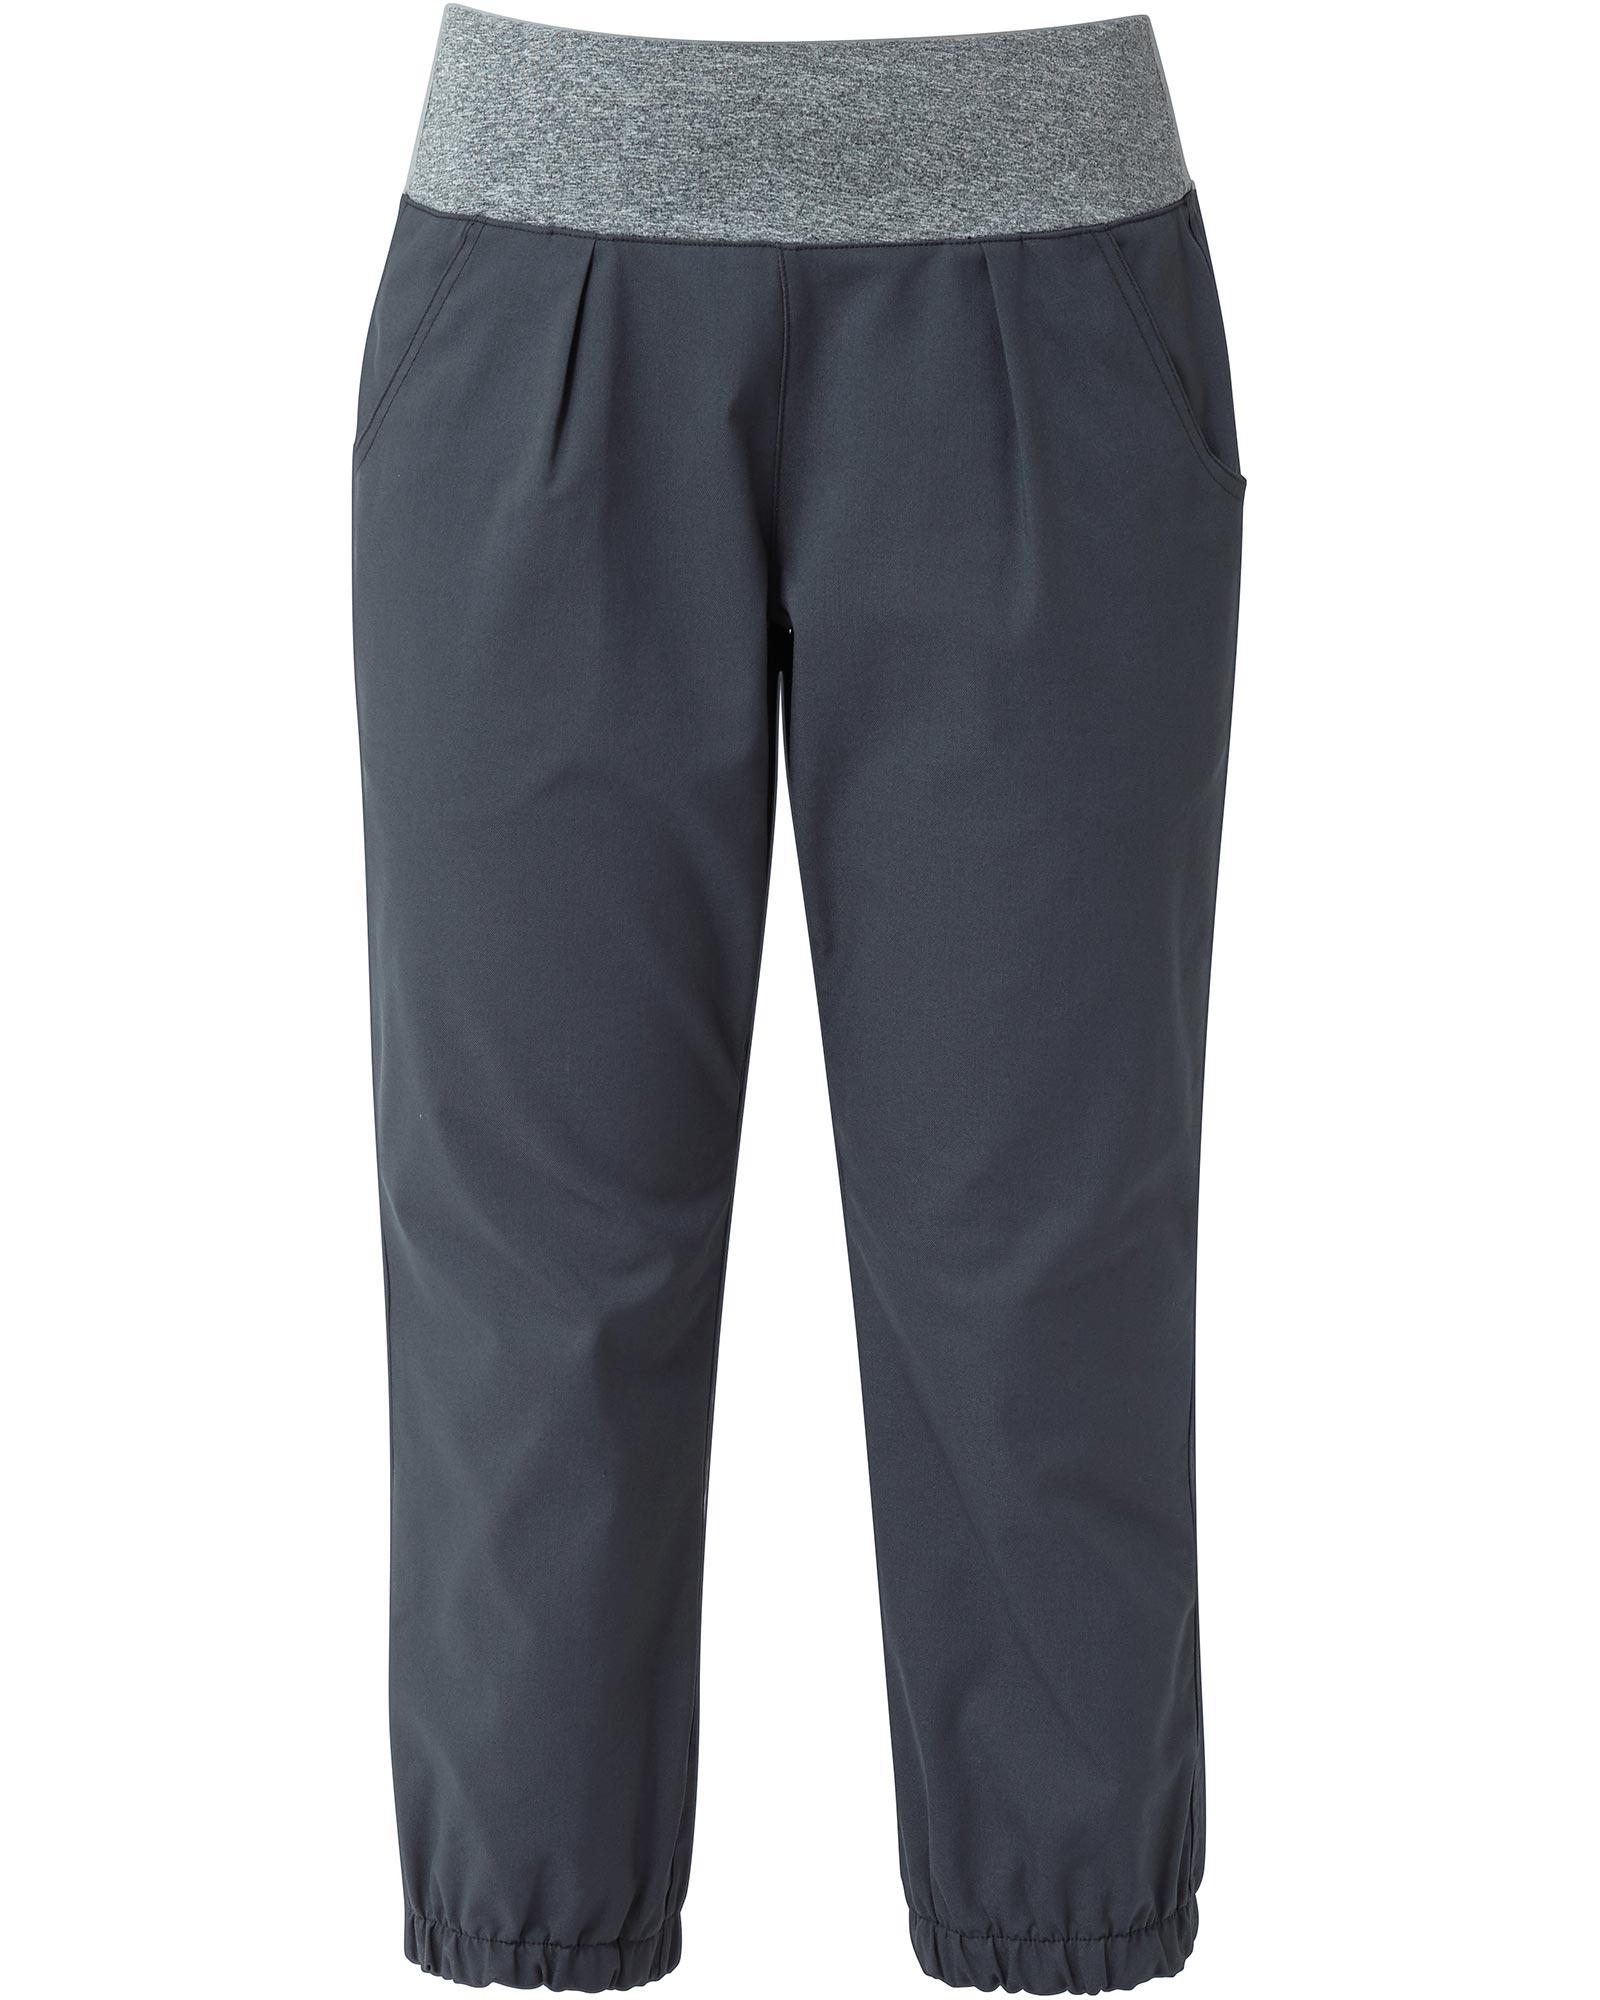 Mountain Equipment Women's Viper Crop Pants 0